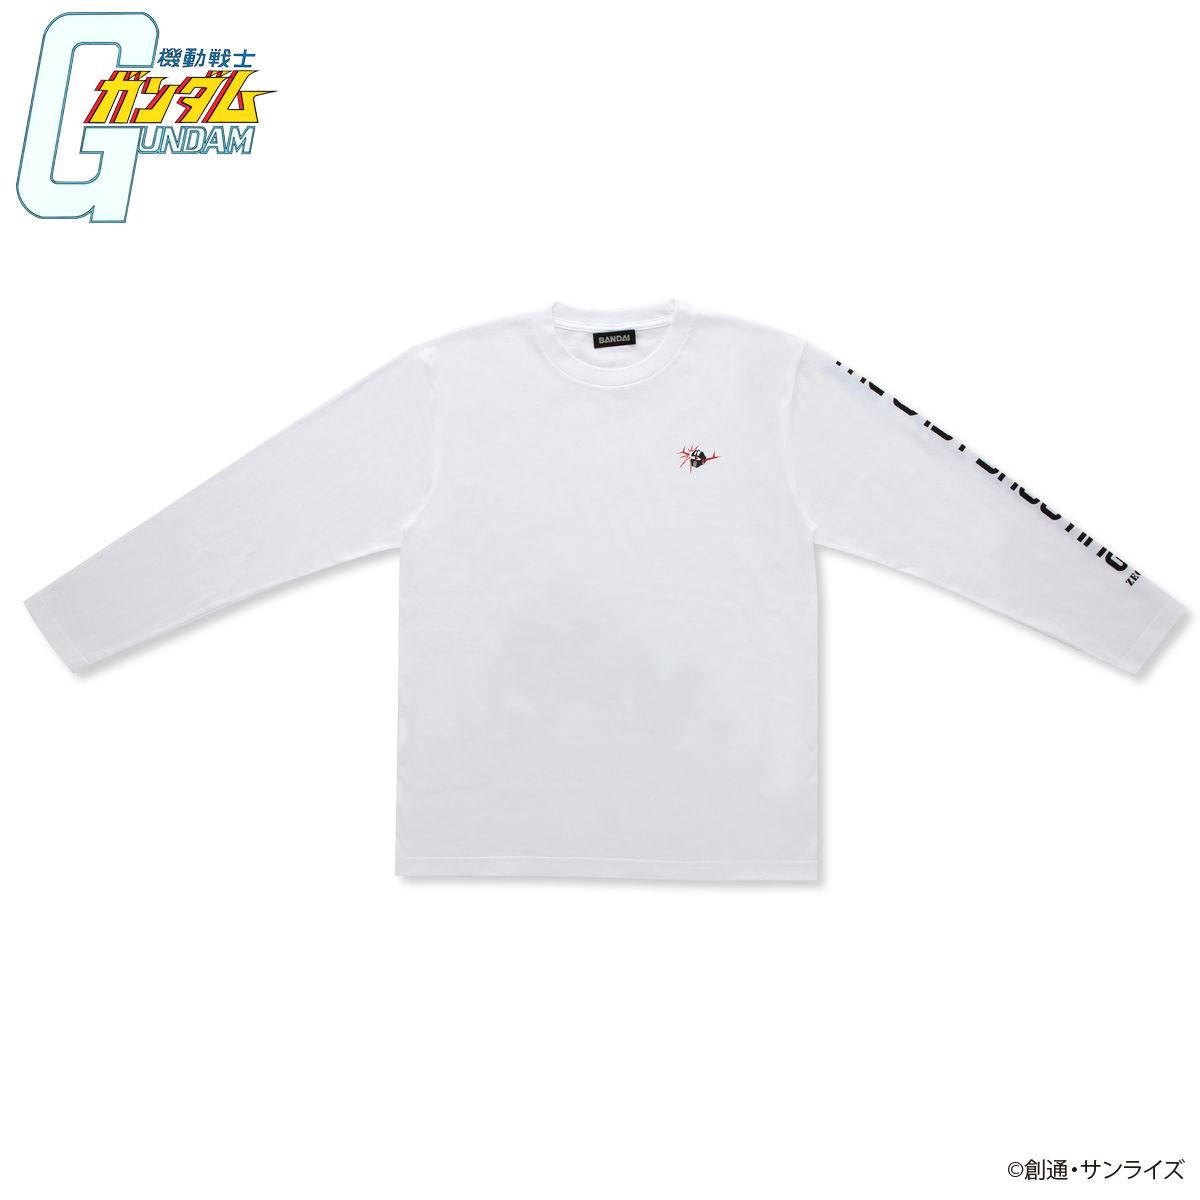 Mobile Suit Gundam The Last Shooting Zeong Long-Sleeve T-shirt